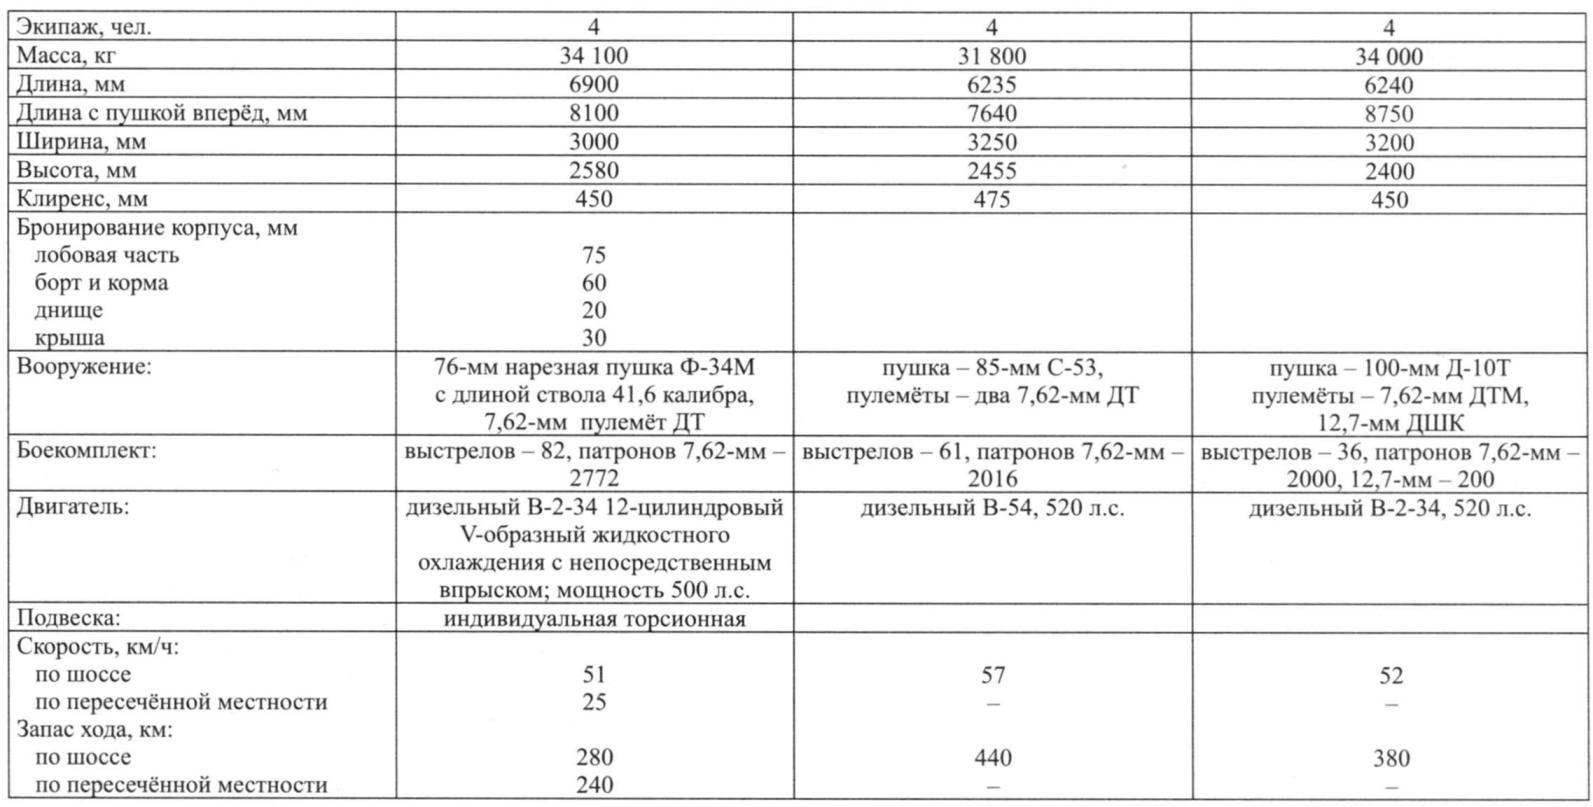 ТАКТИКО-ТЕХНИЧЕСКИЕ ХАРАКТЕРИСТИКИ СРЕДНЕГО ТАНКА Т-43, Т-44А, Т-44-100